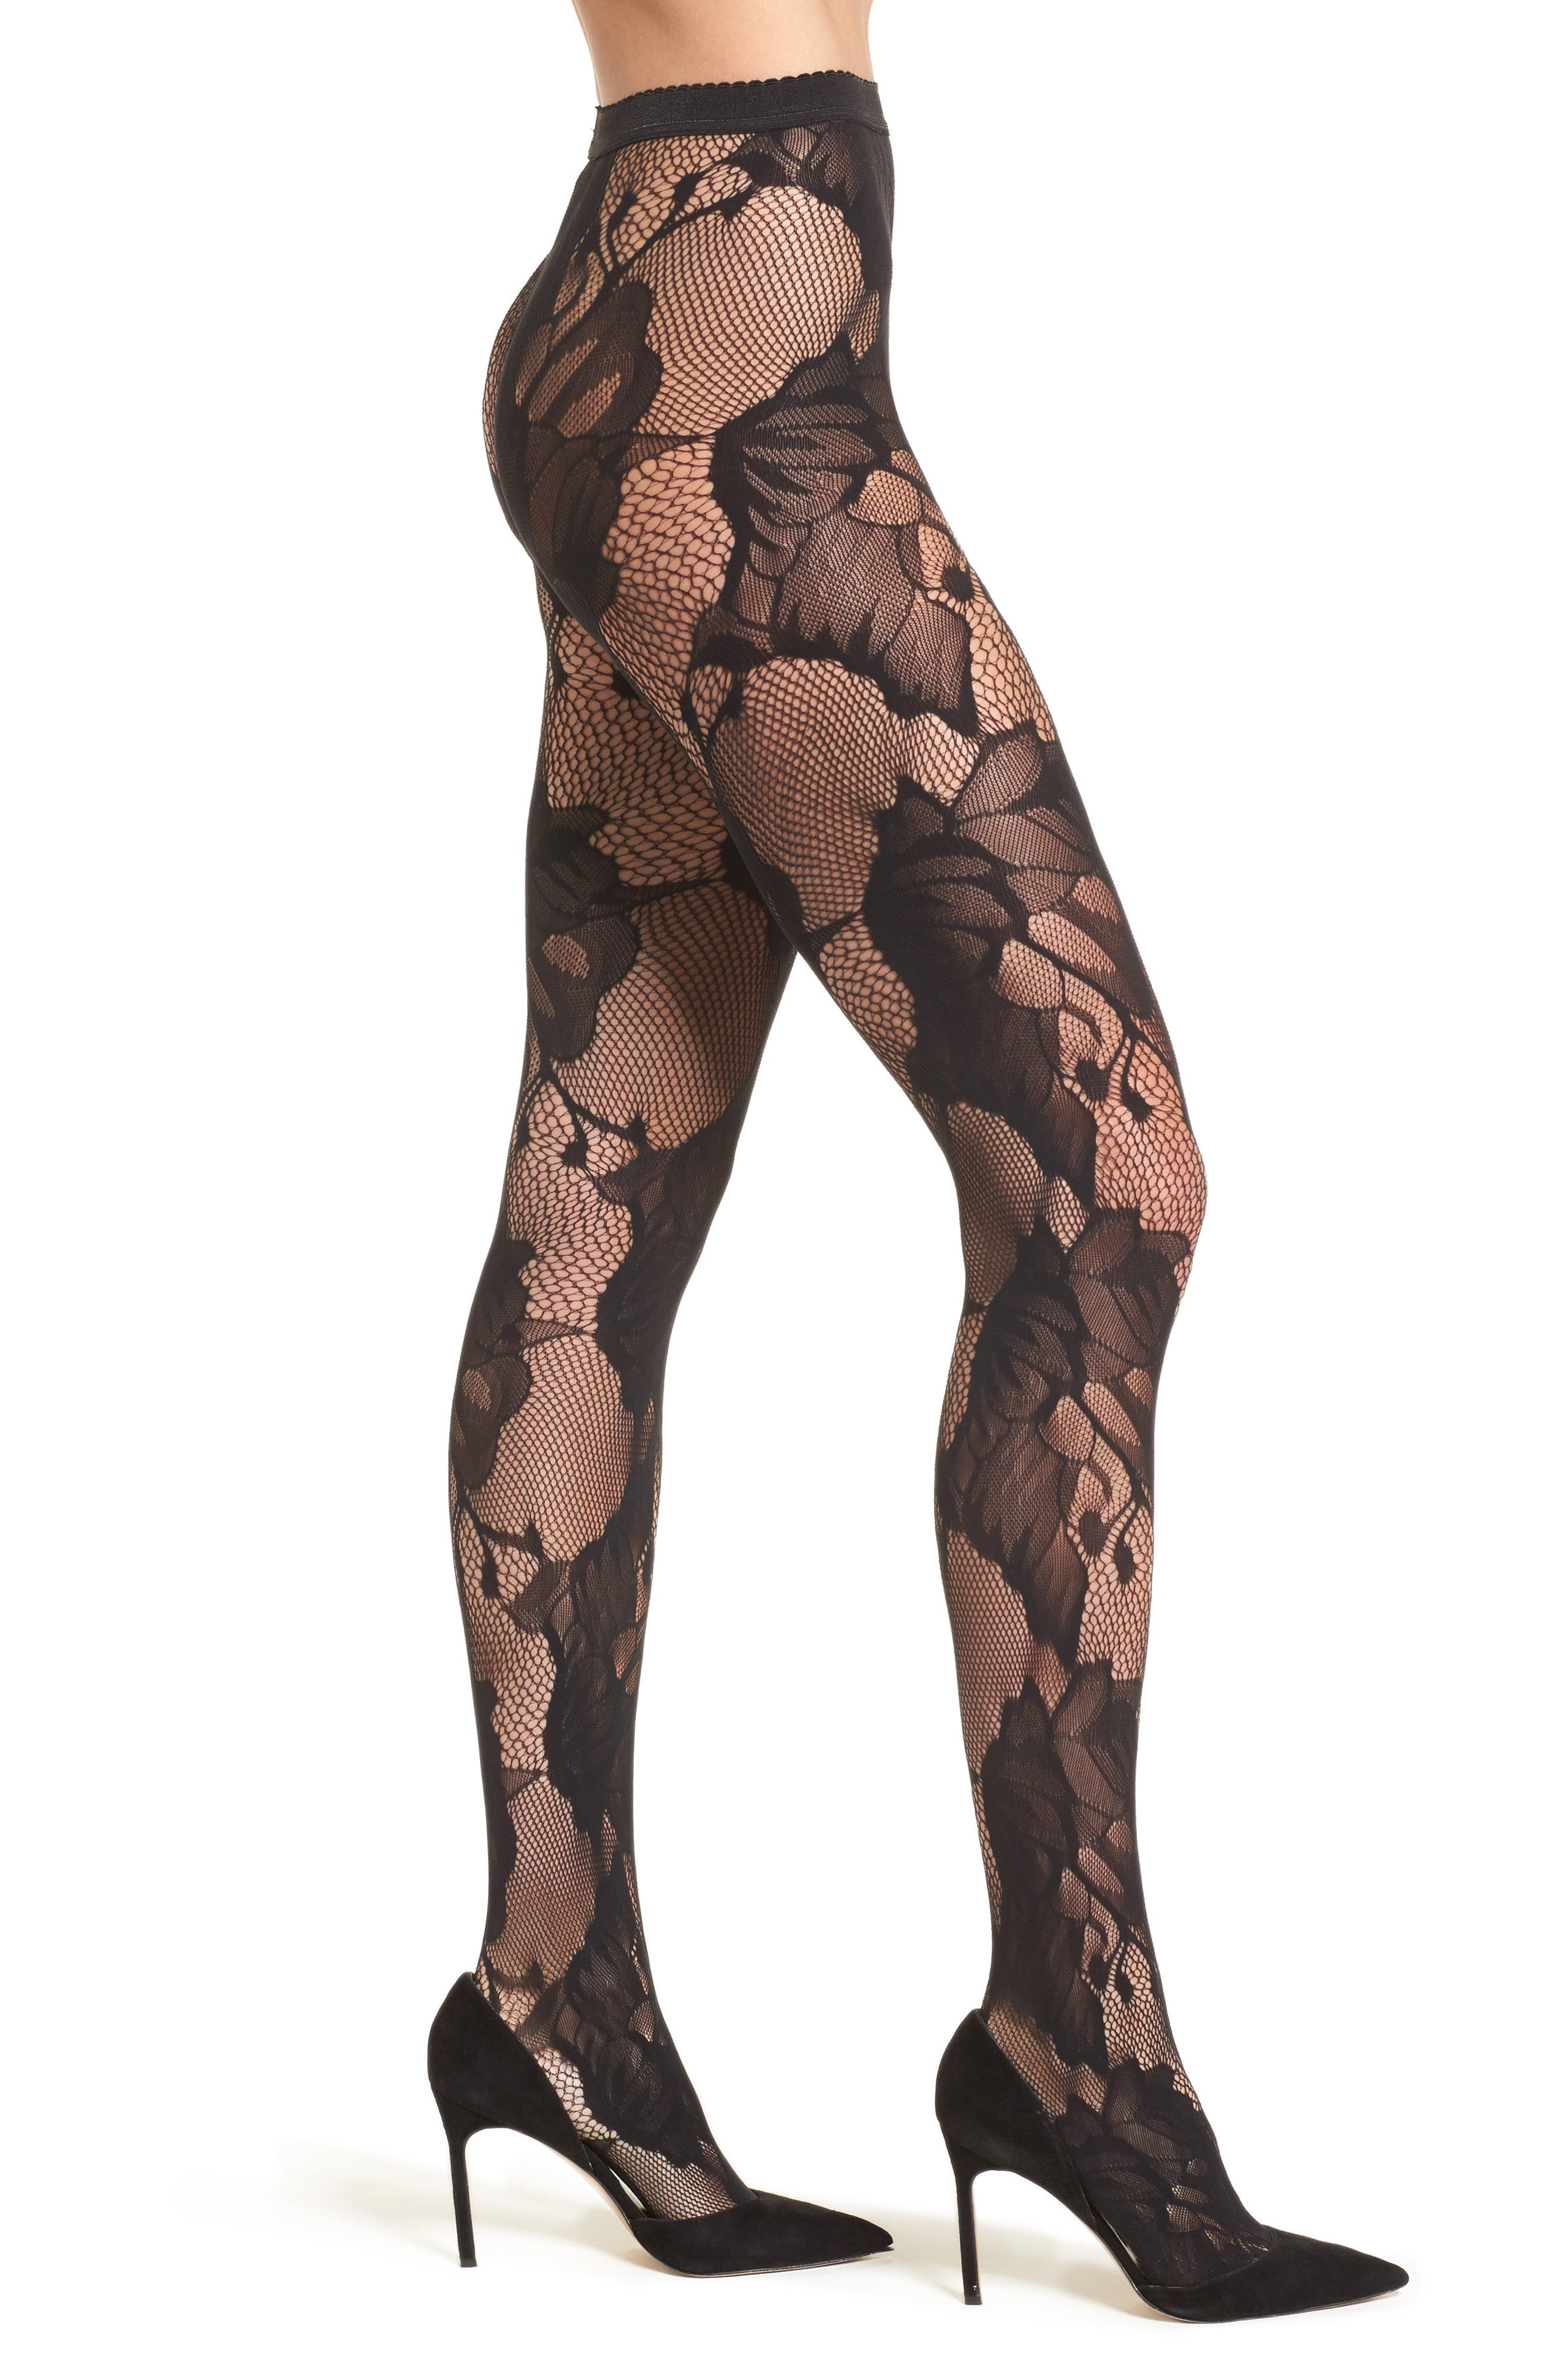 Pat Floral Lace Tights,                         Main,                         color, Black